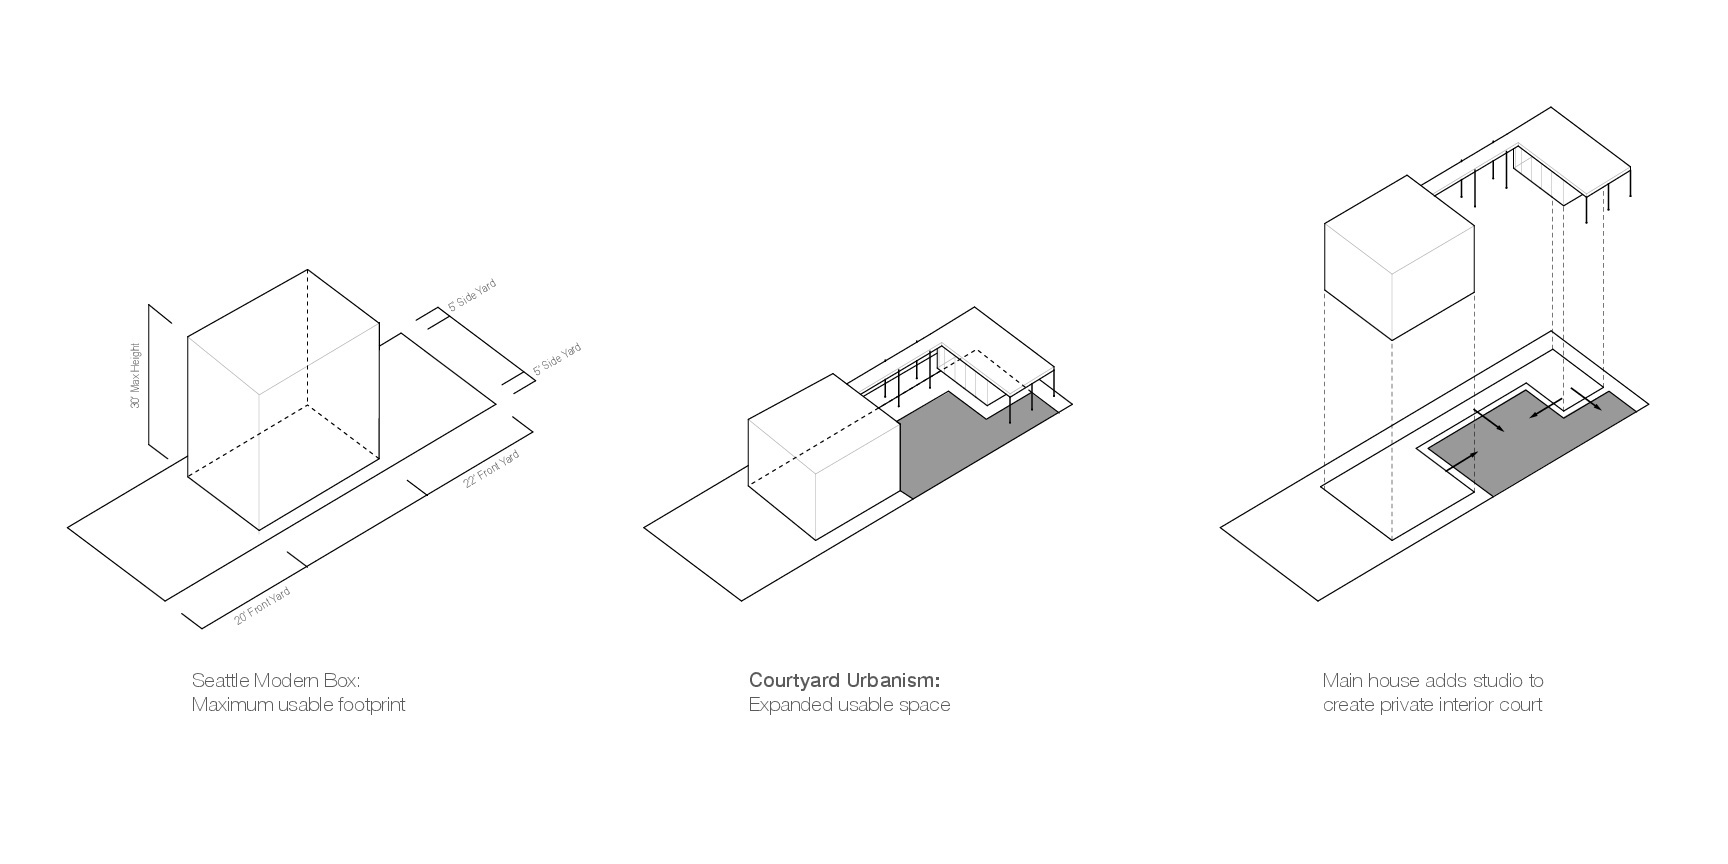 hight resolution of grasshopper studio and courtyard wittman estes concept diagram